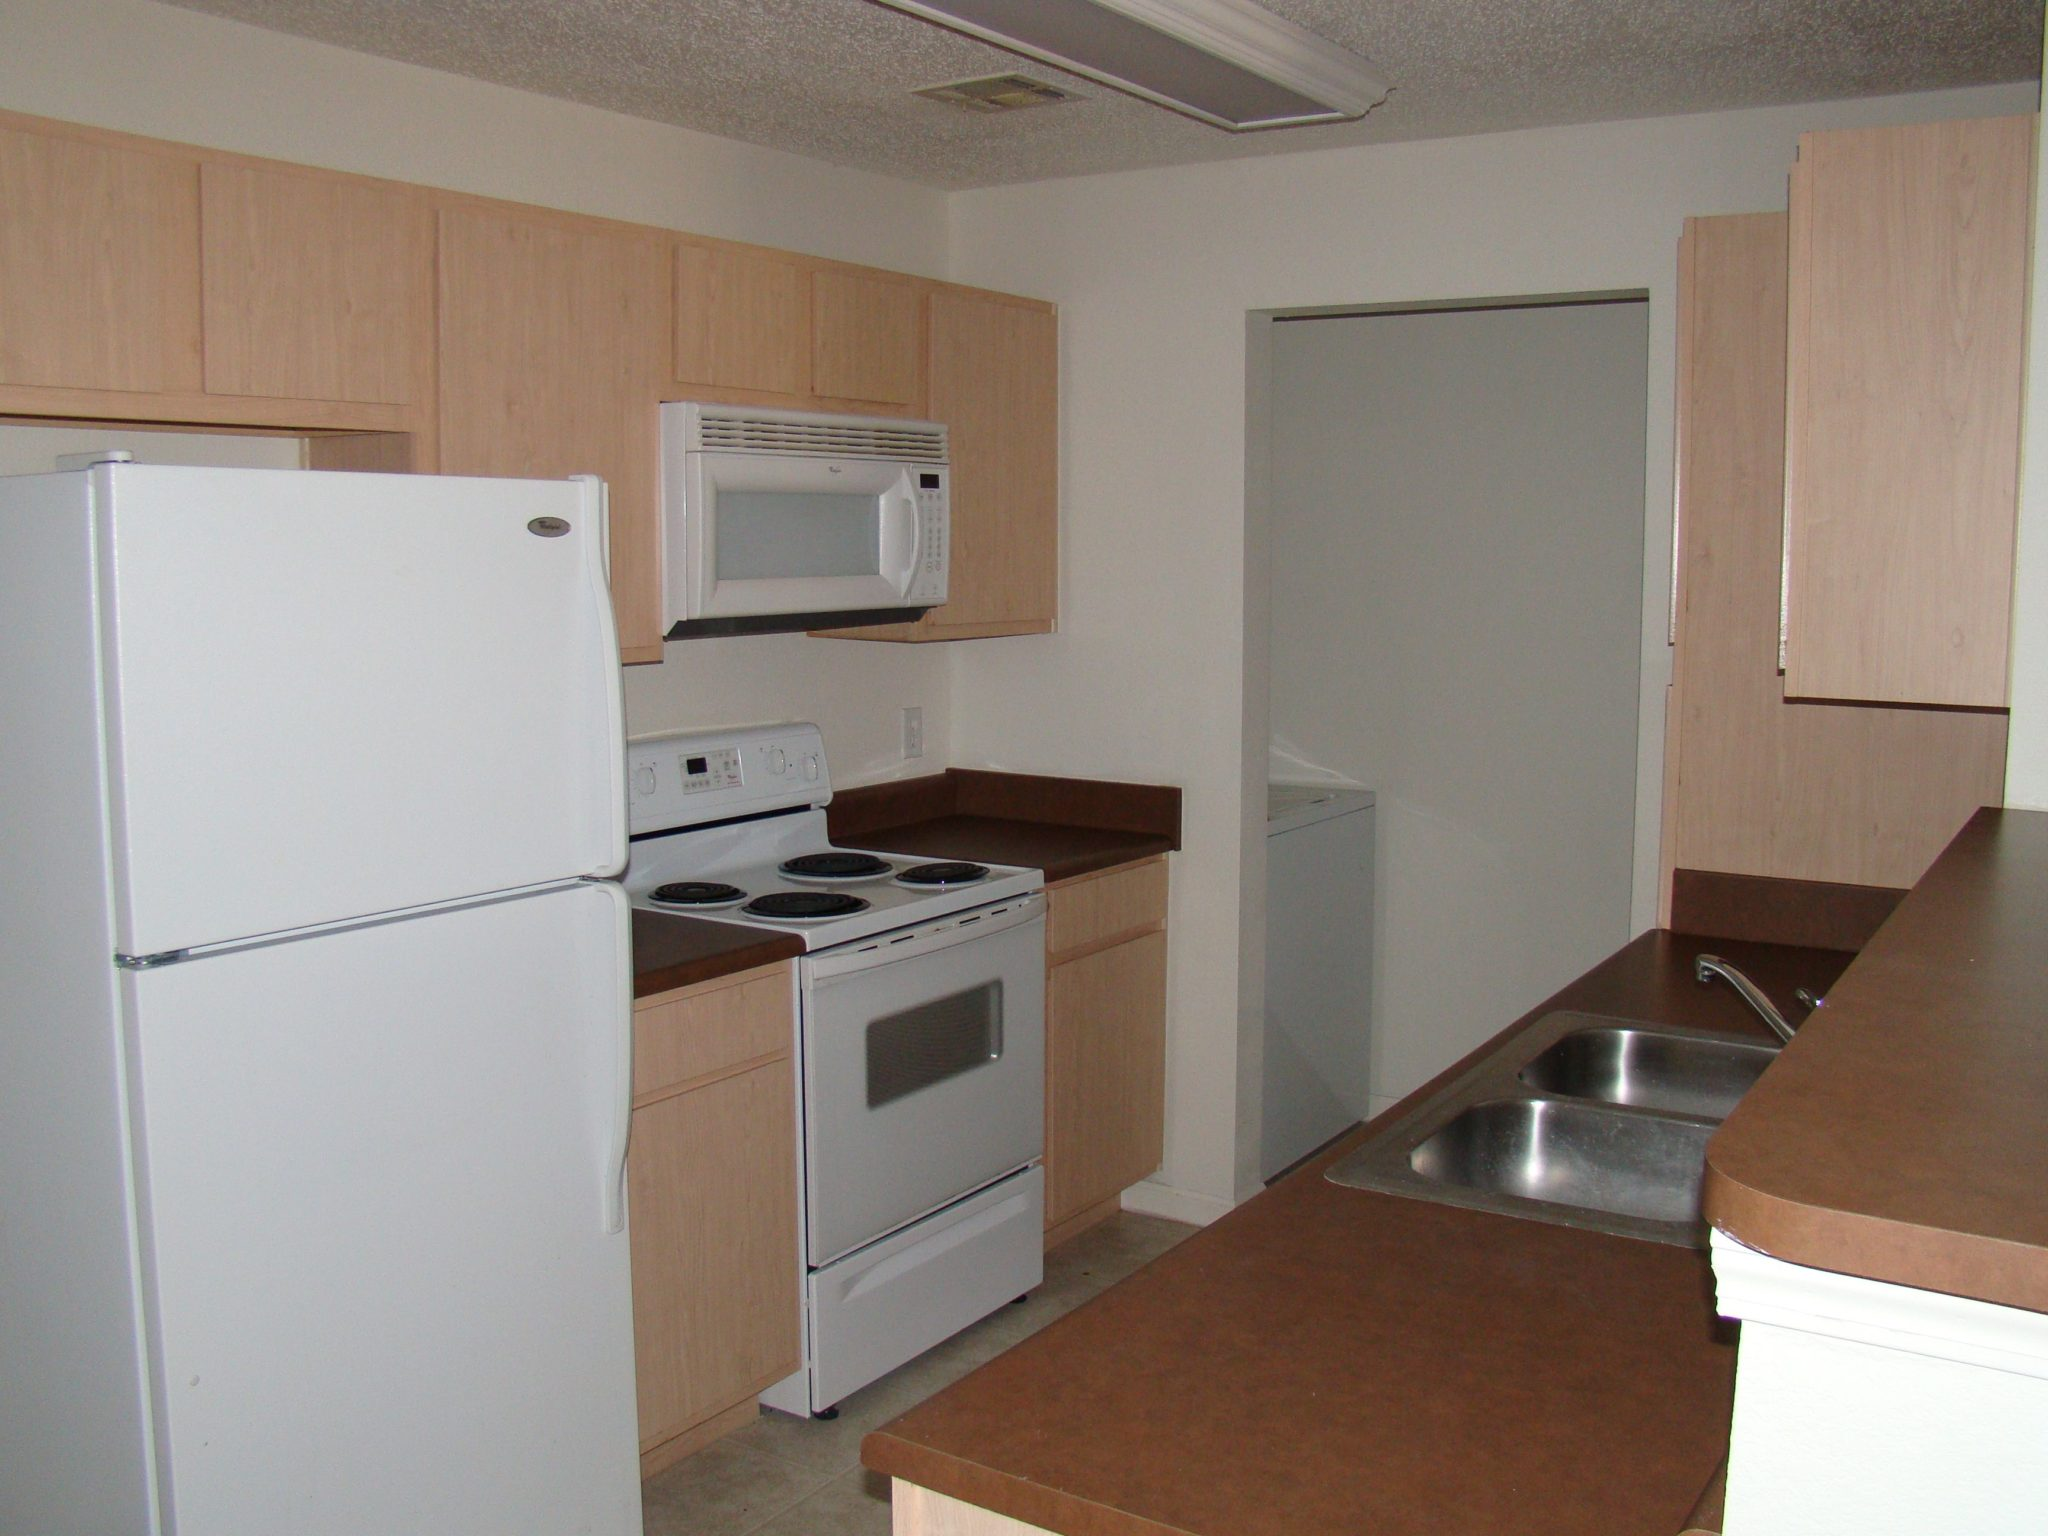 Knollwood-Heights-Big-Spring-Texas-kitchen